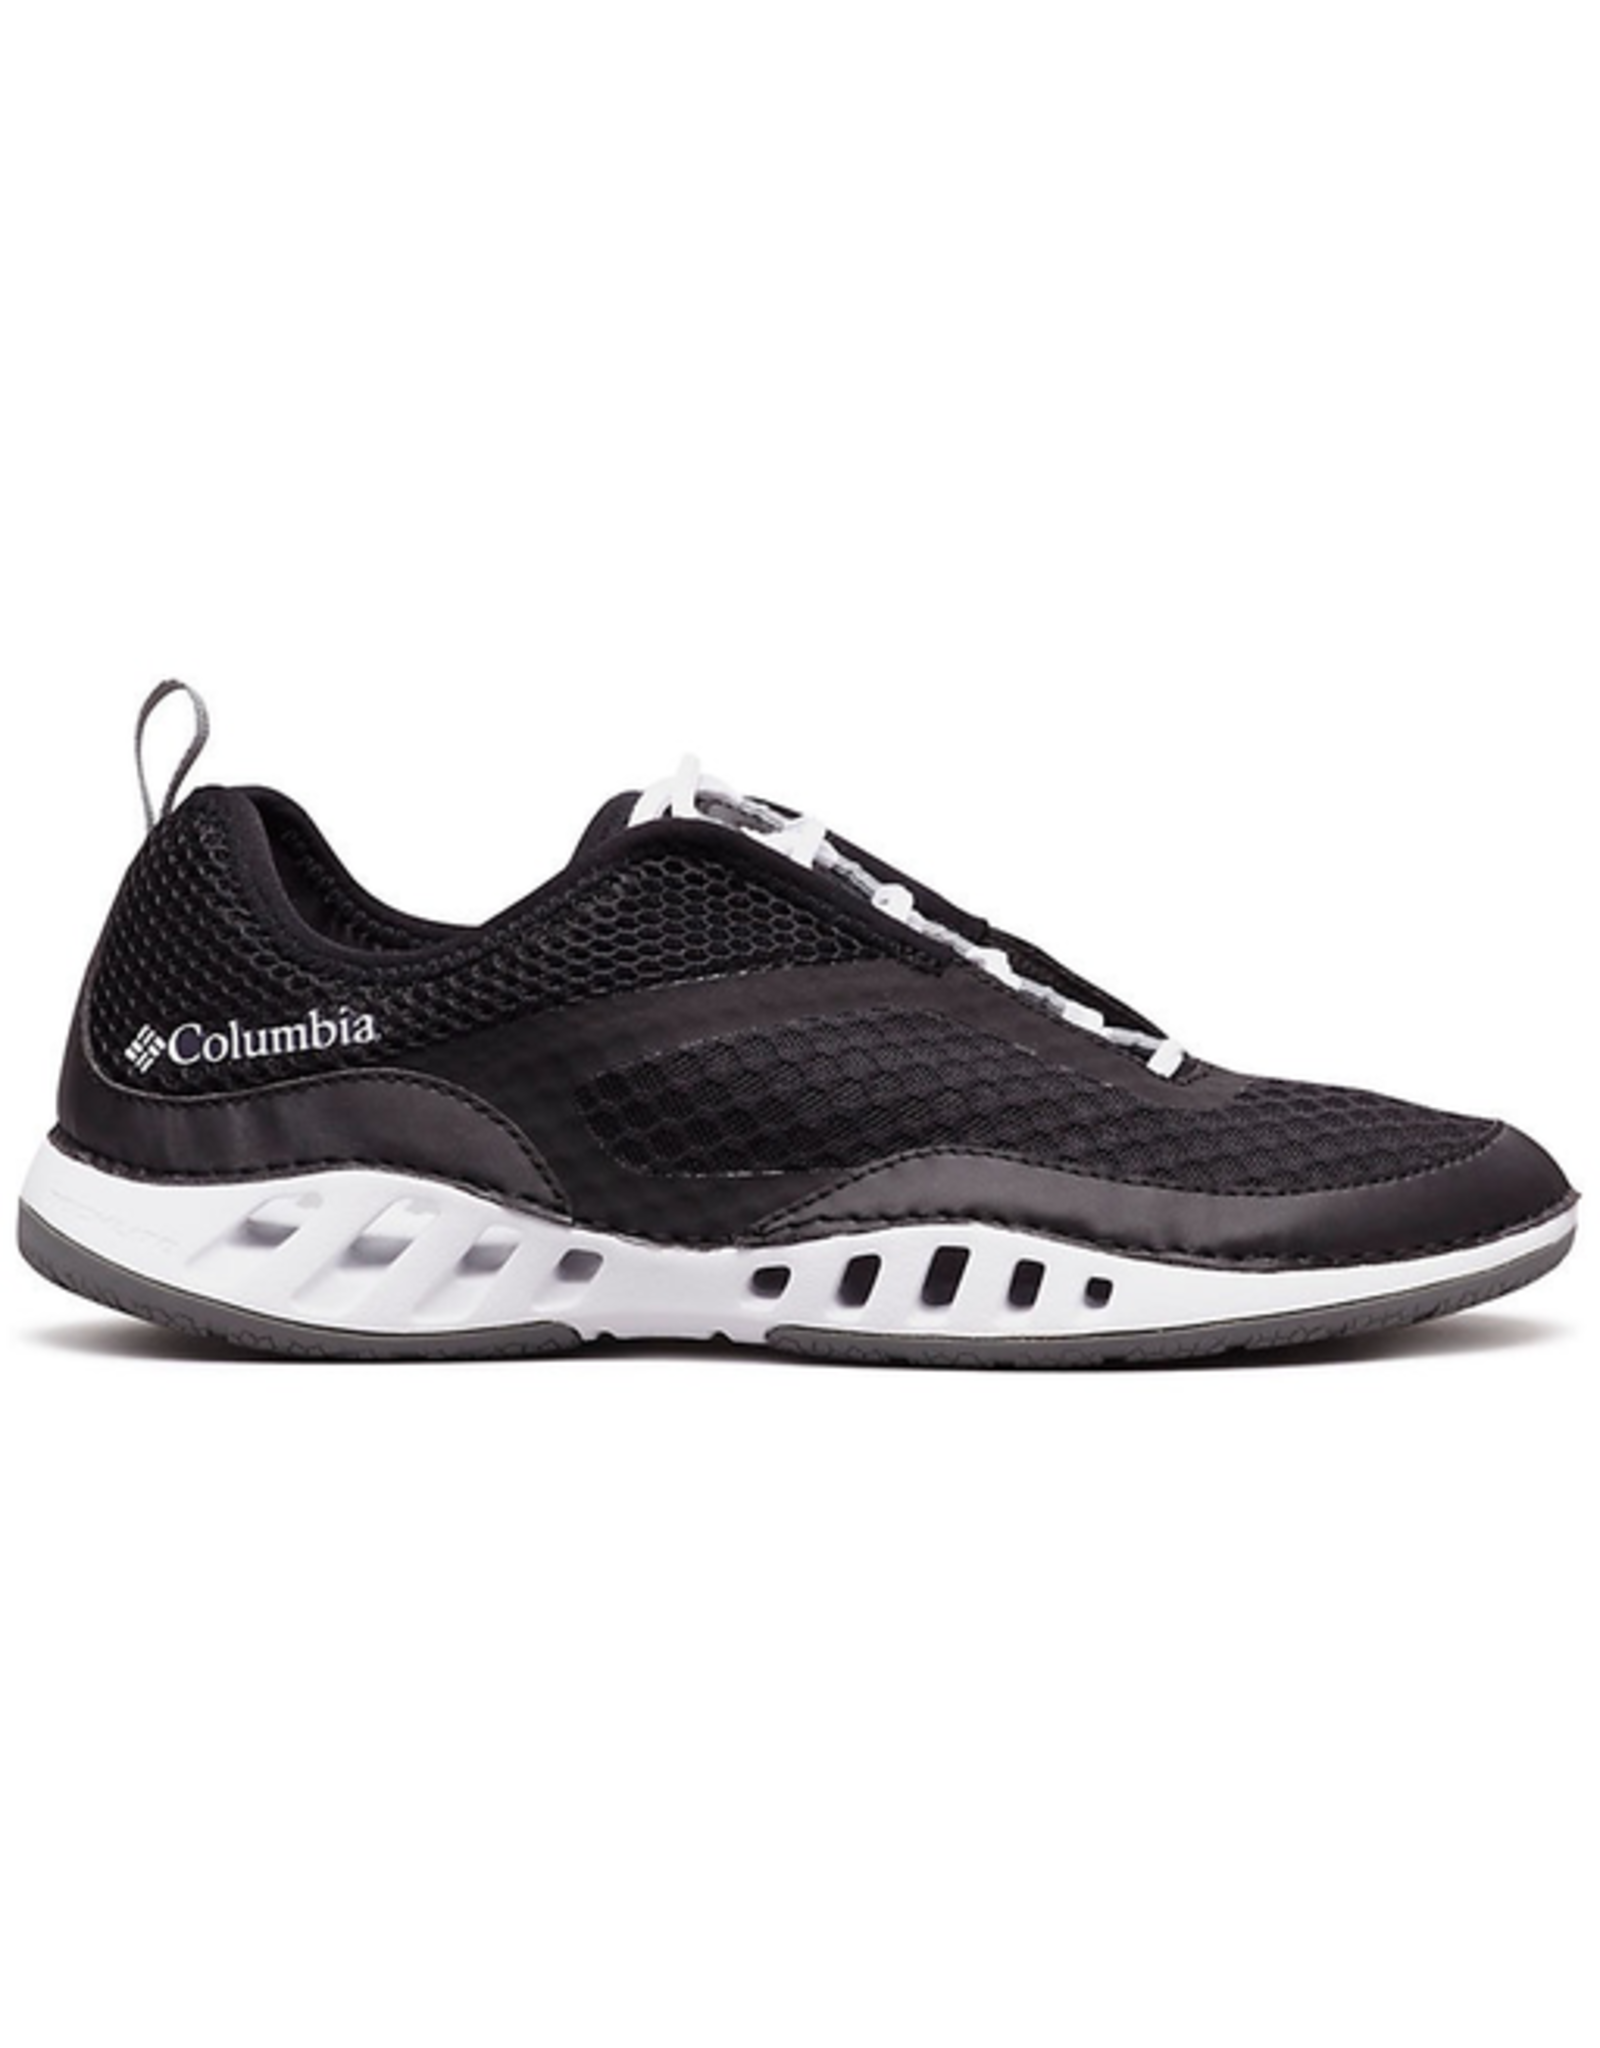 Columbia Columbia Men's Drainmaker 3D Shoe